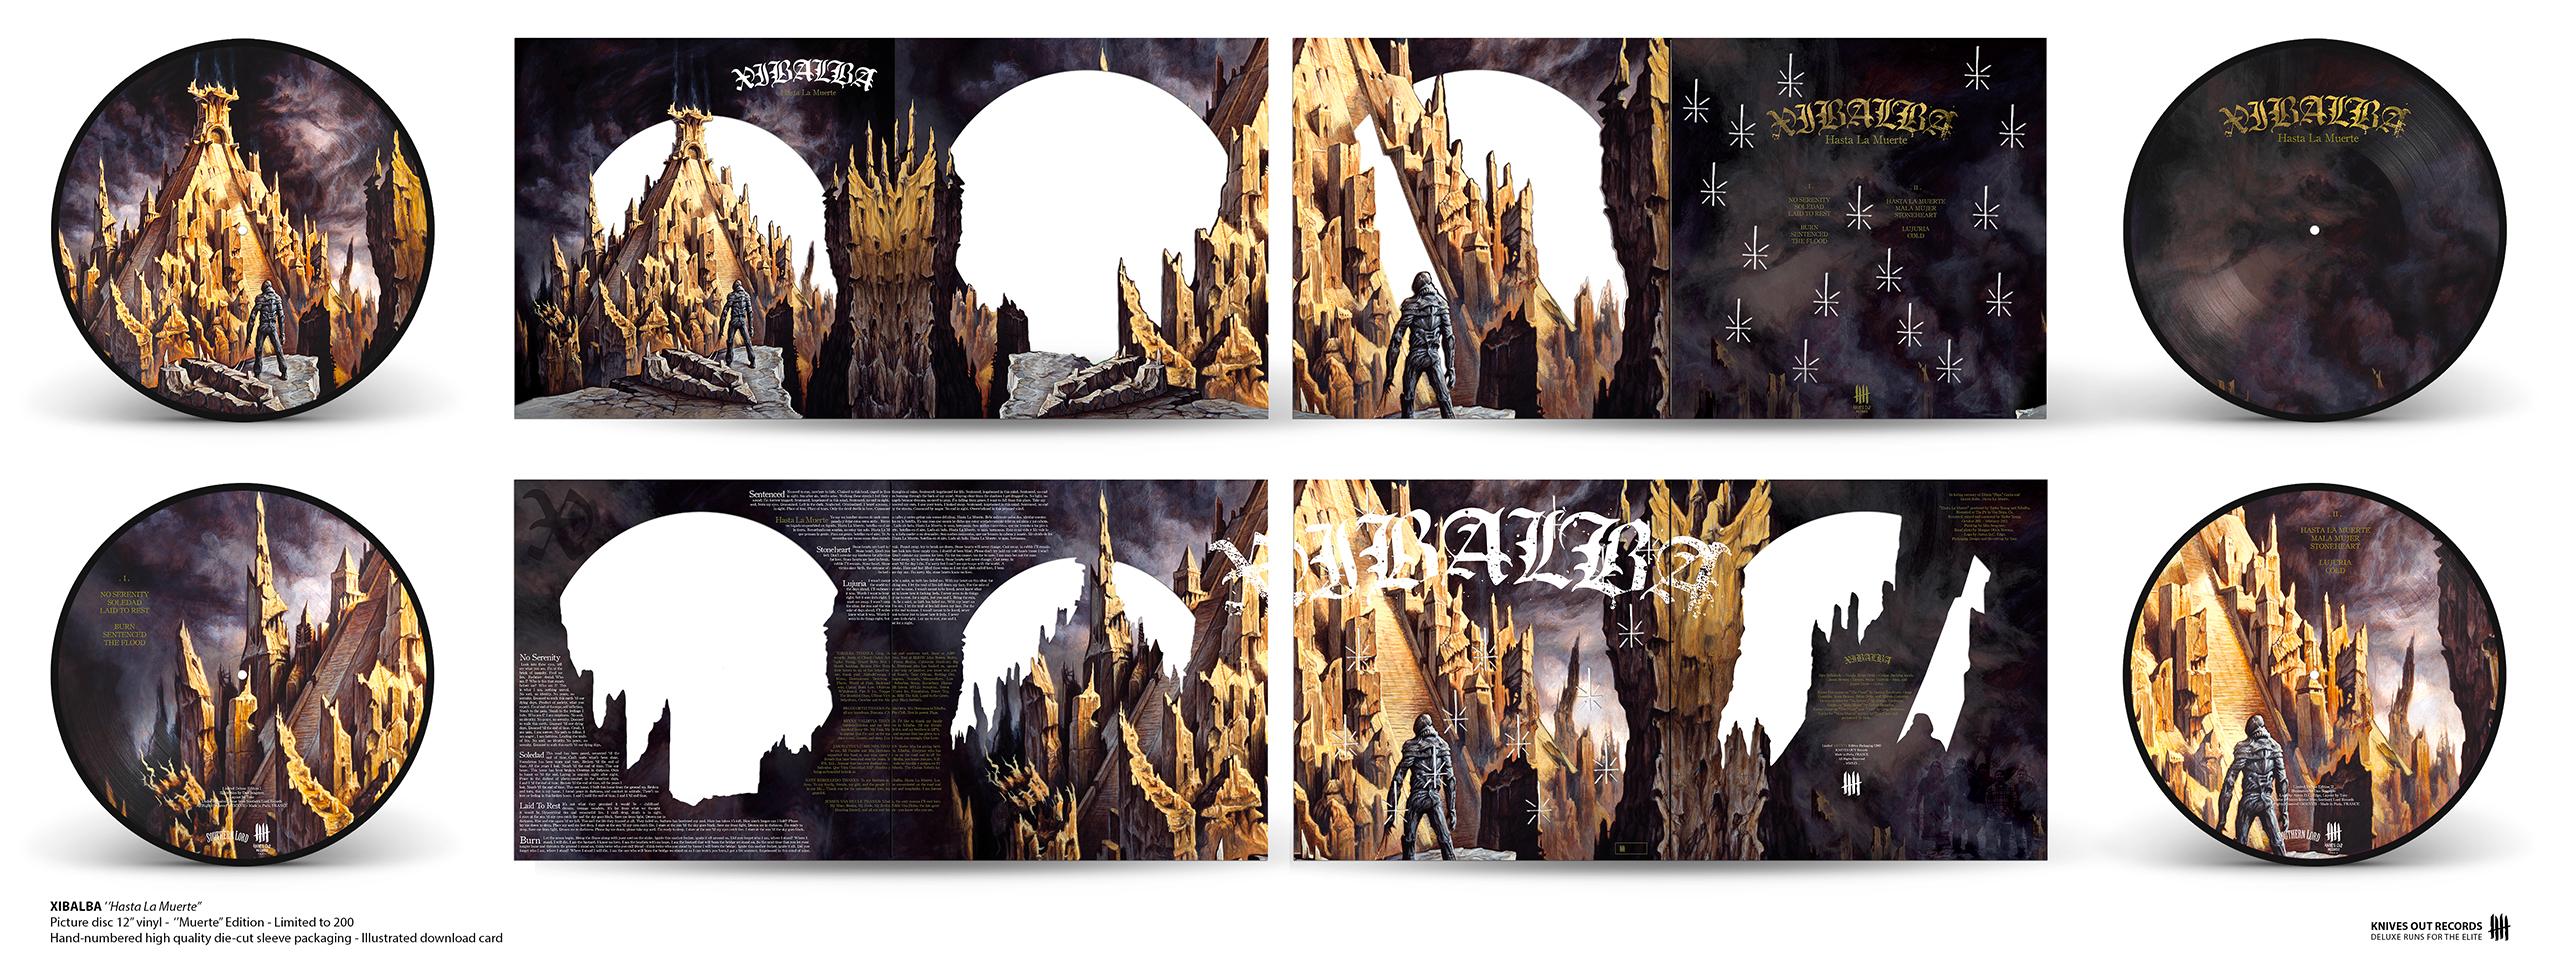 "XIBALBA Hasta La Muerte Double Picture Disc 12"" vinyl - Muerte KNIVES Edition"